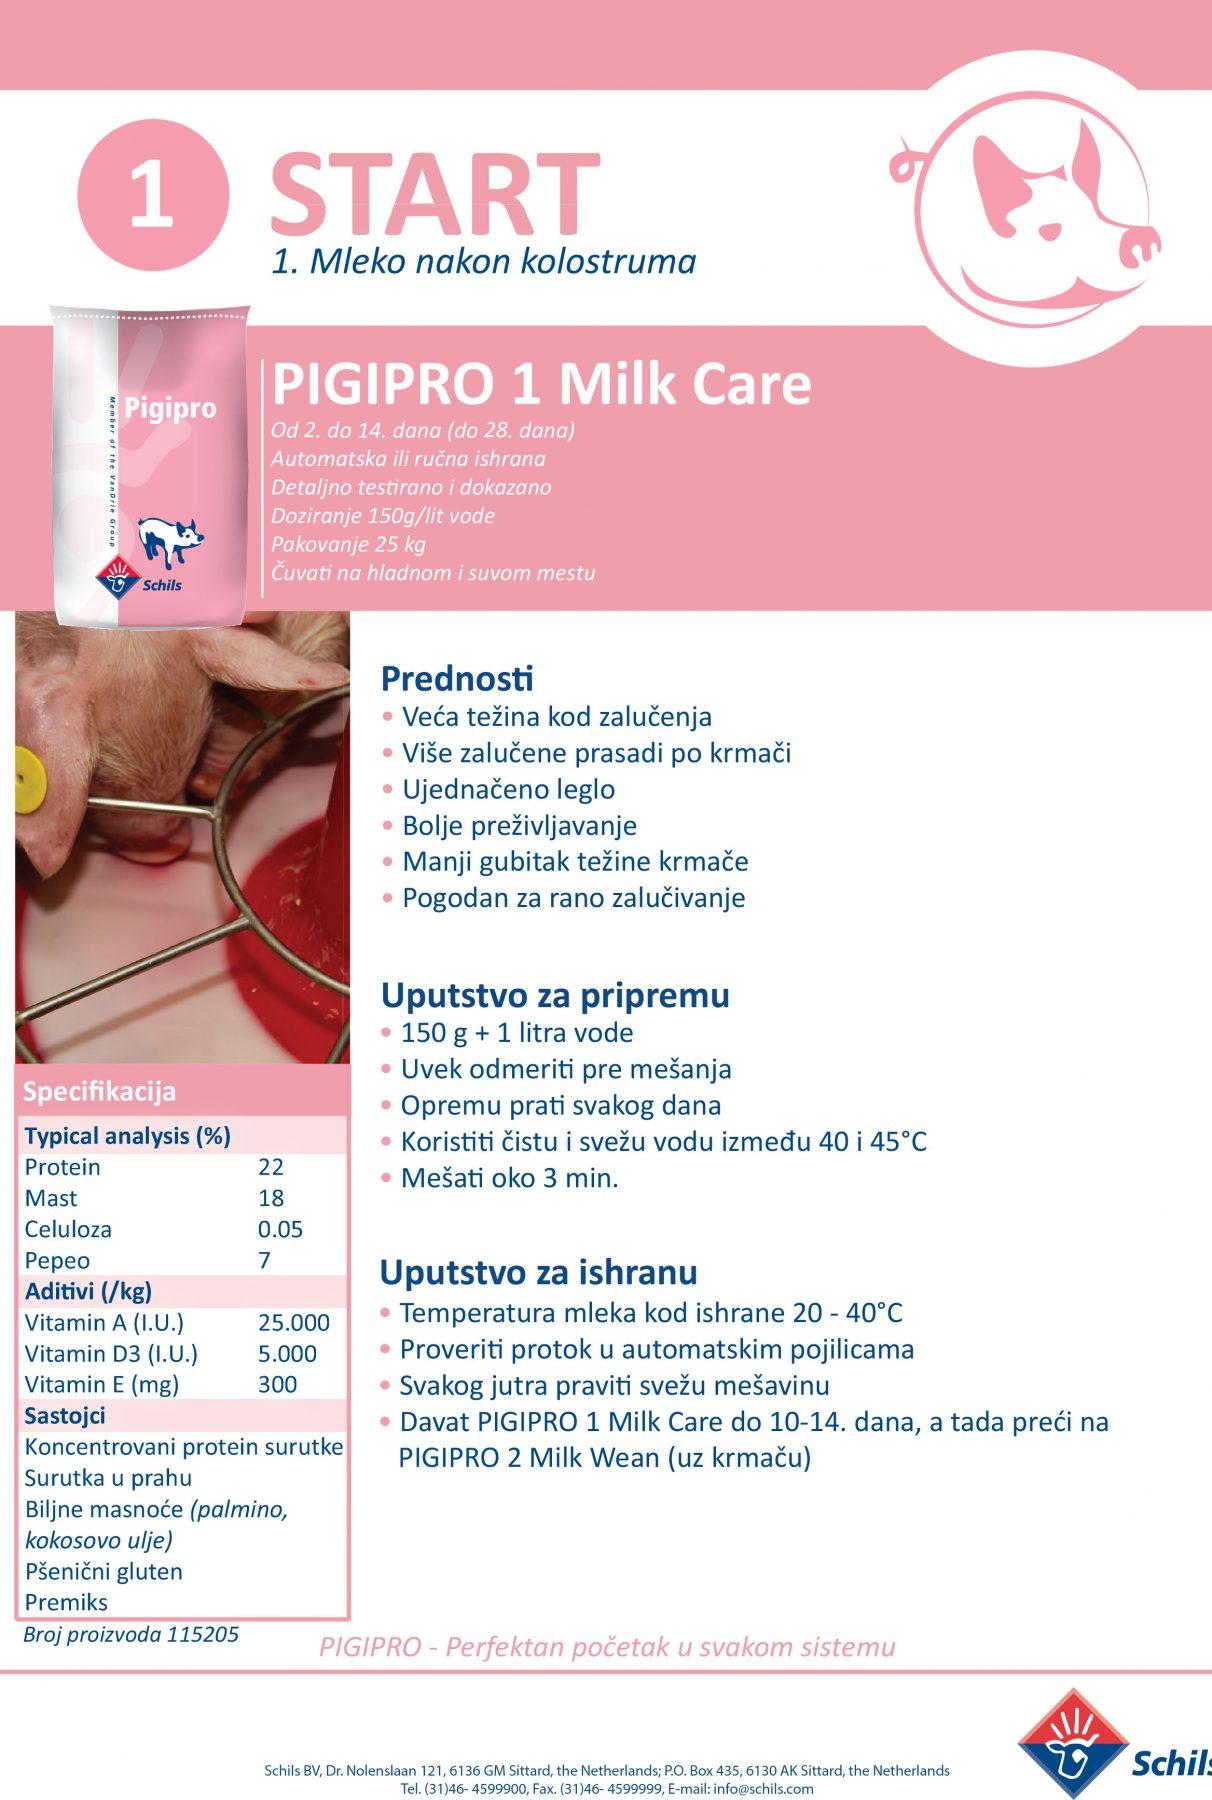 PDS_Pigipro 1 Milk Care_SRB 2016.pdf